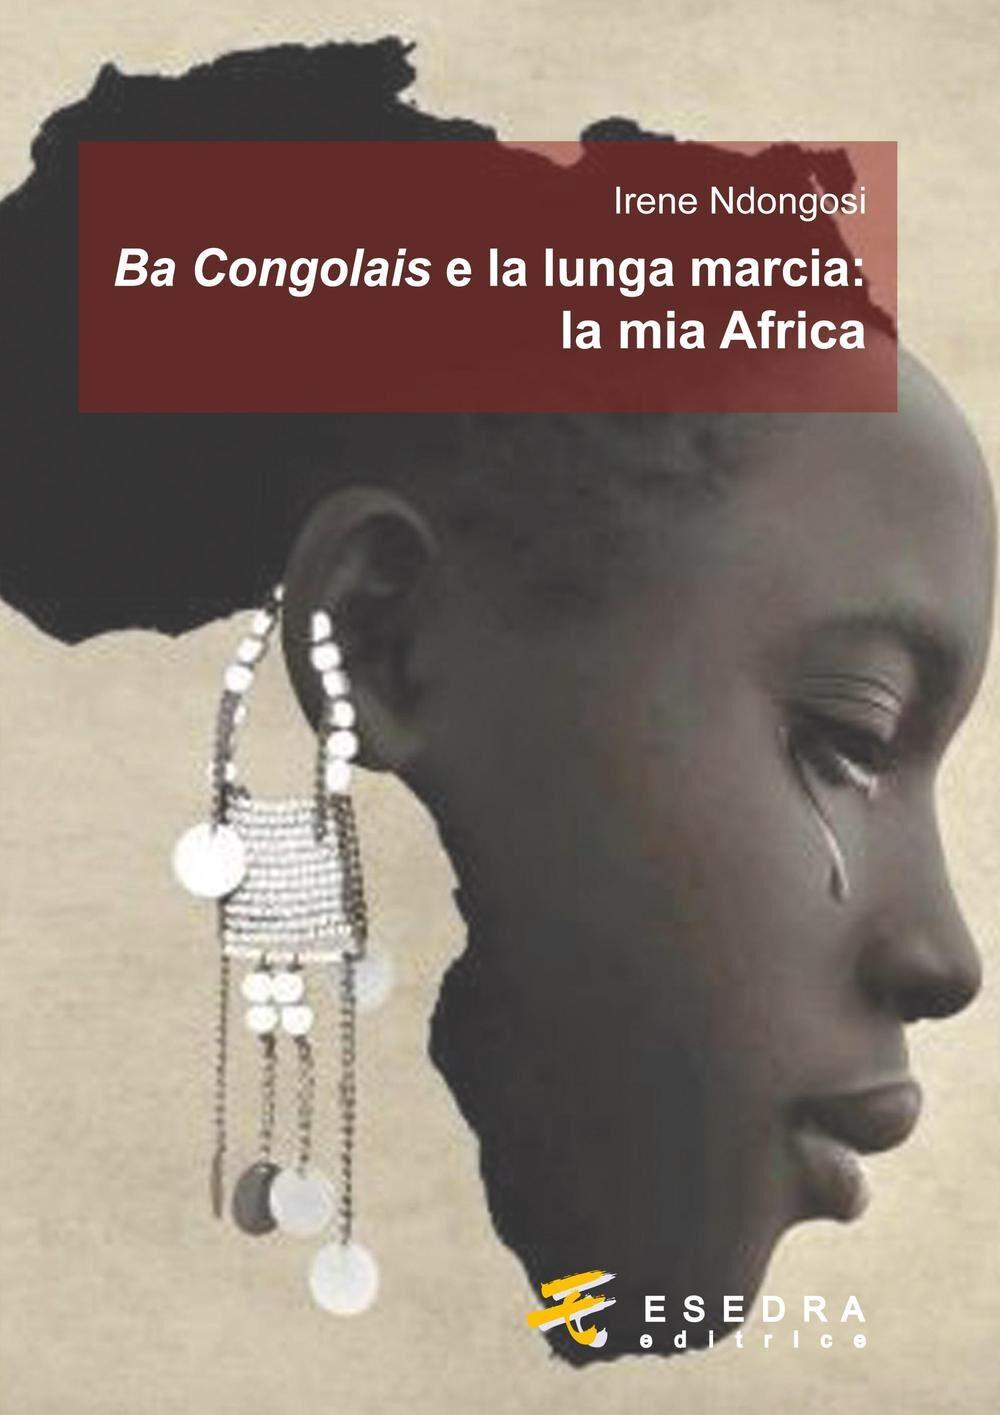 Ba Congolais e la lunga marcia: la mia Africa